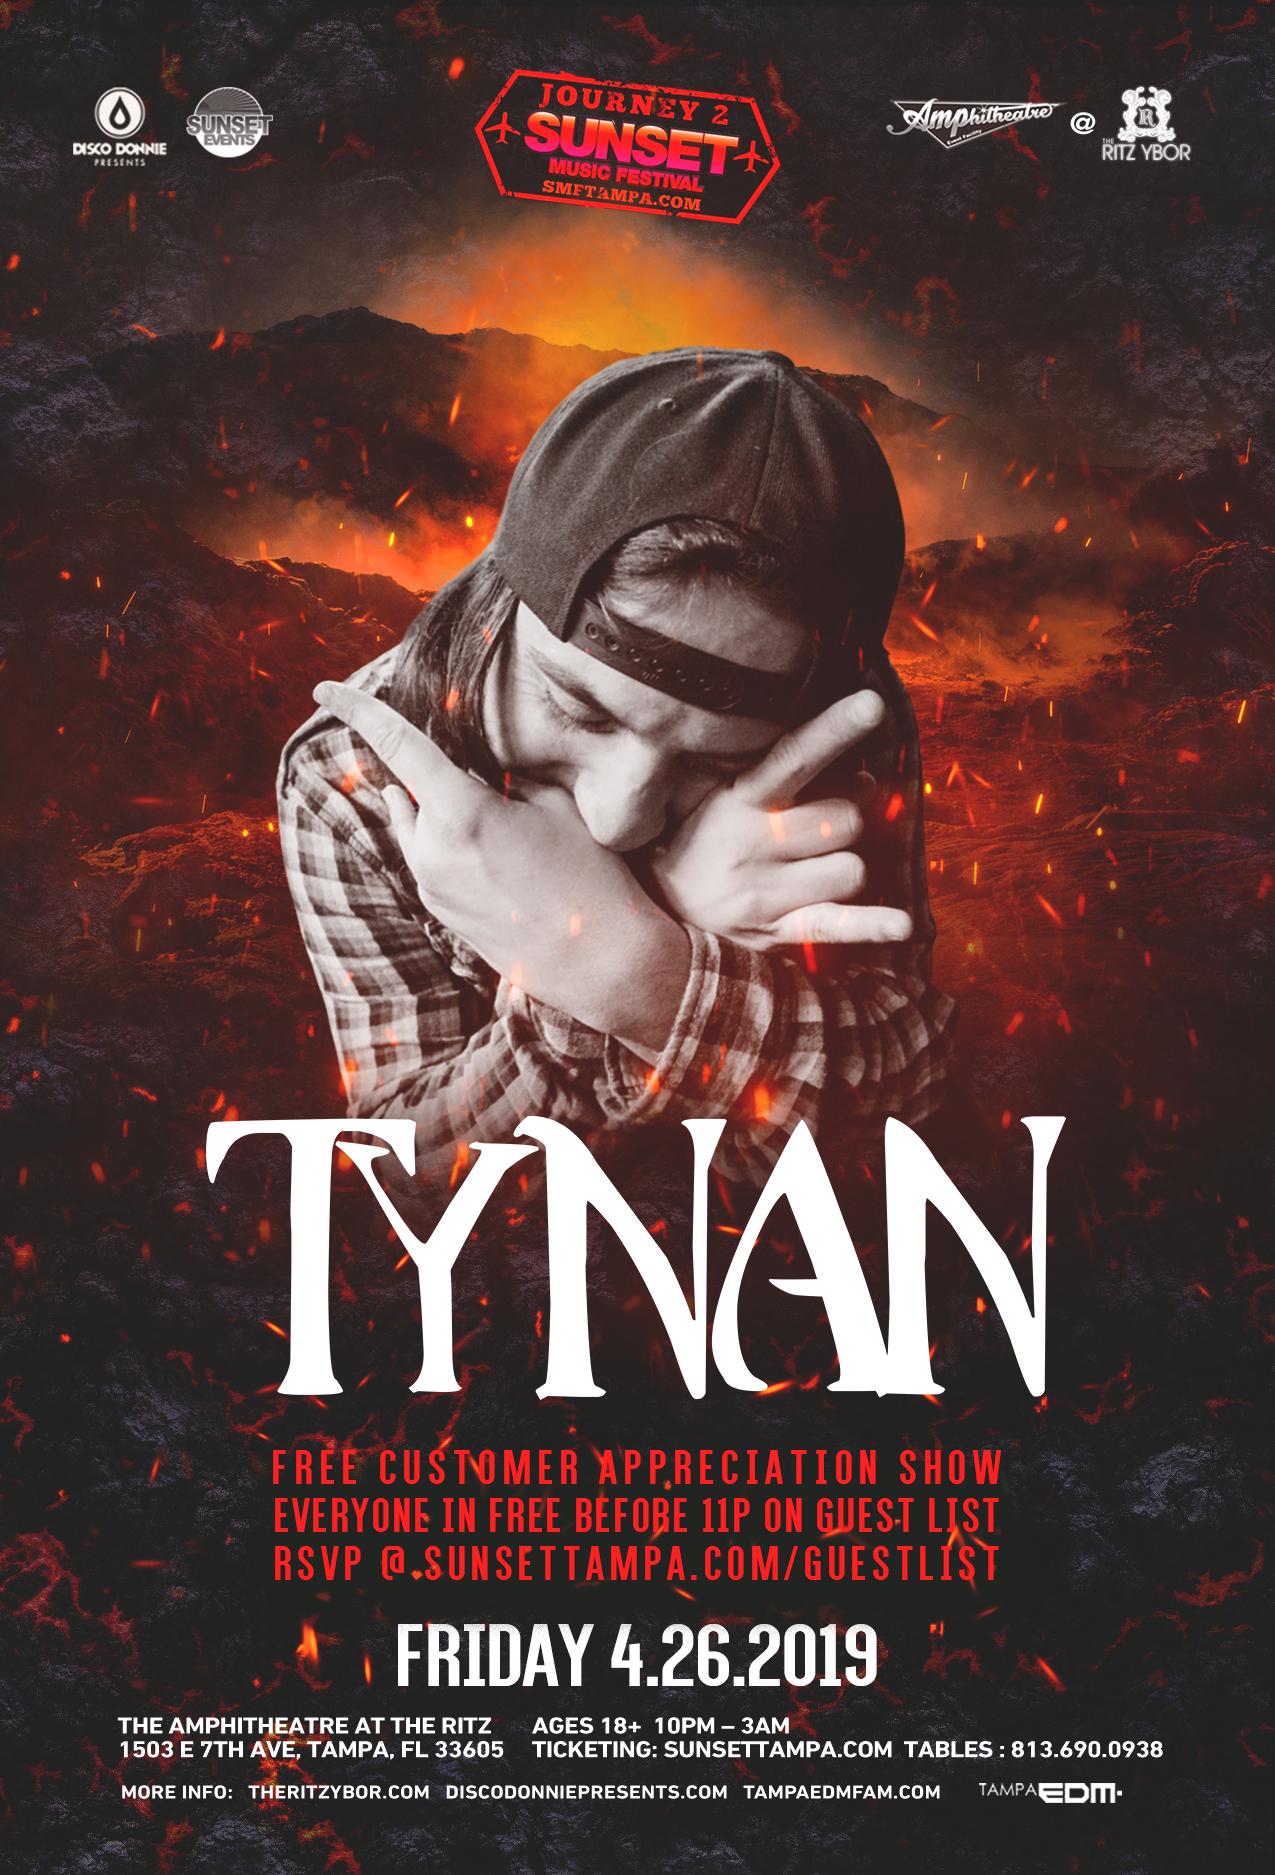 Tynan – Journey 2 Sunset Music Festival – #POUND Fridays at The RITZ Ybor – 4/26/2019